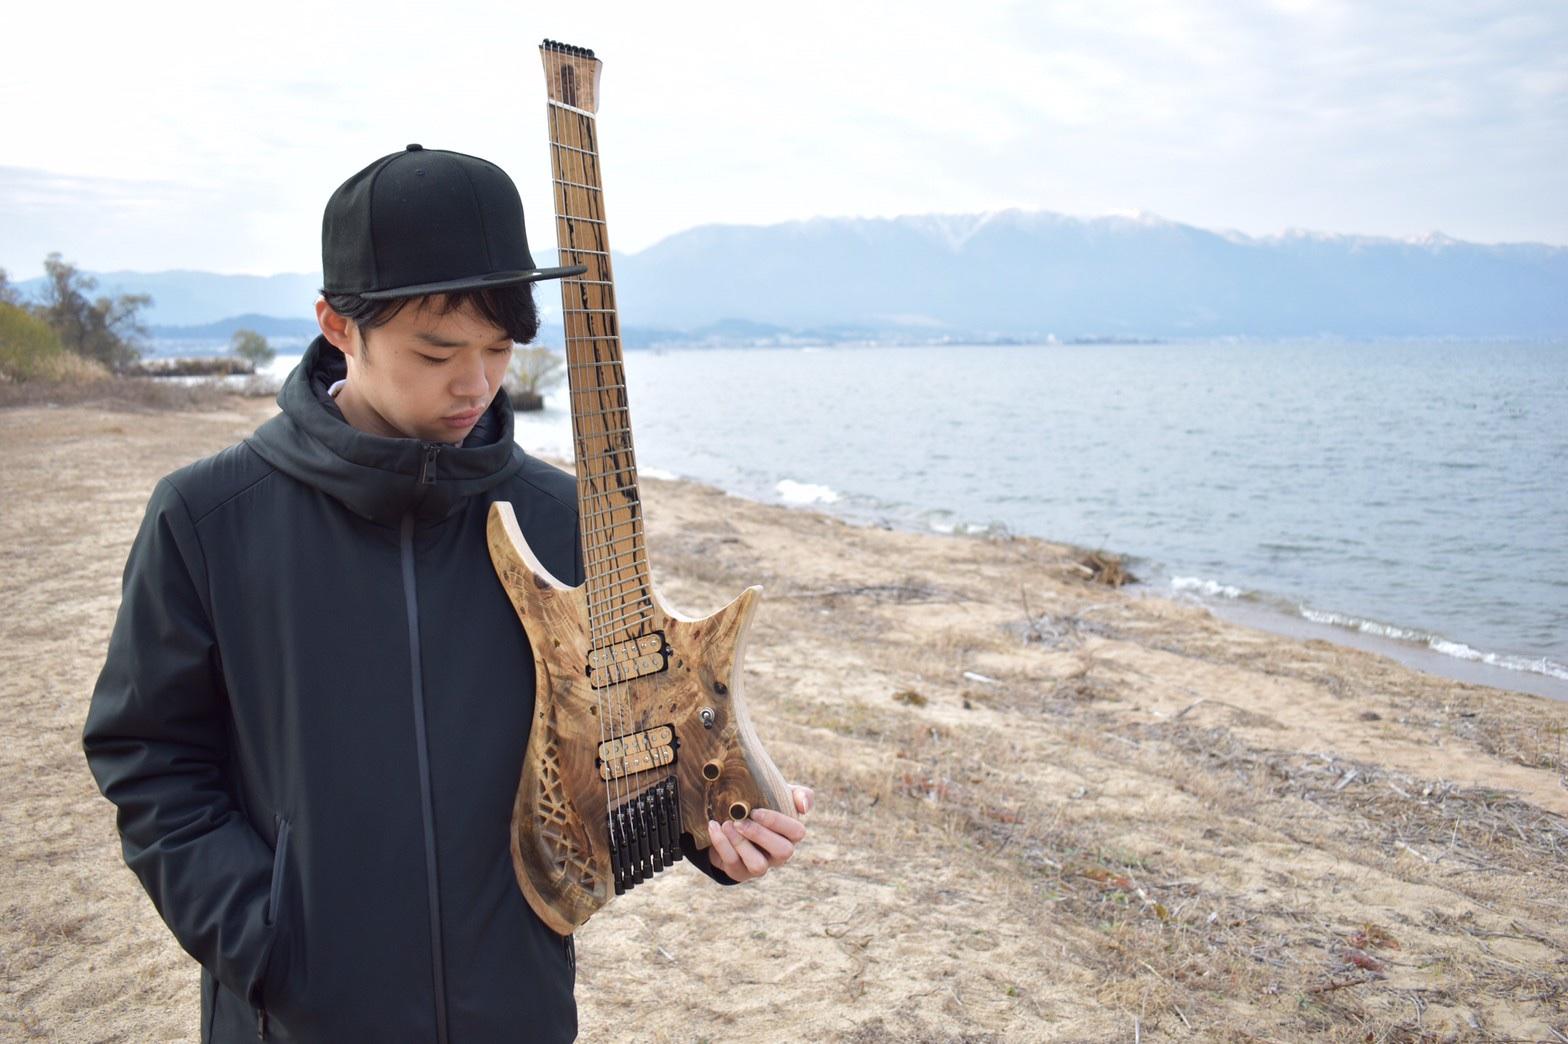 Yusuke Nagano